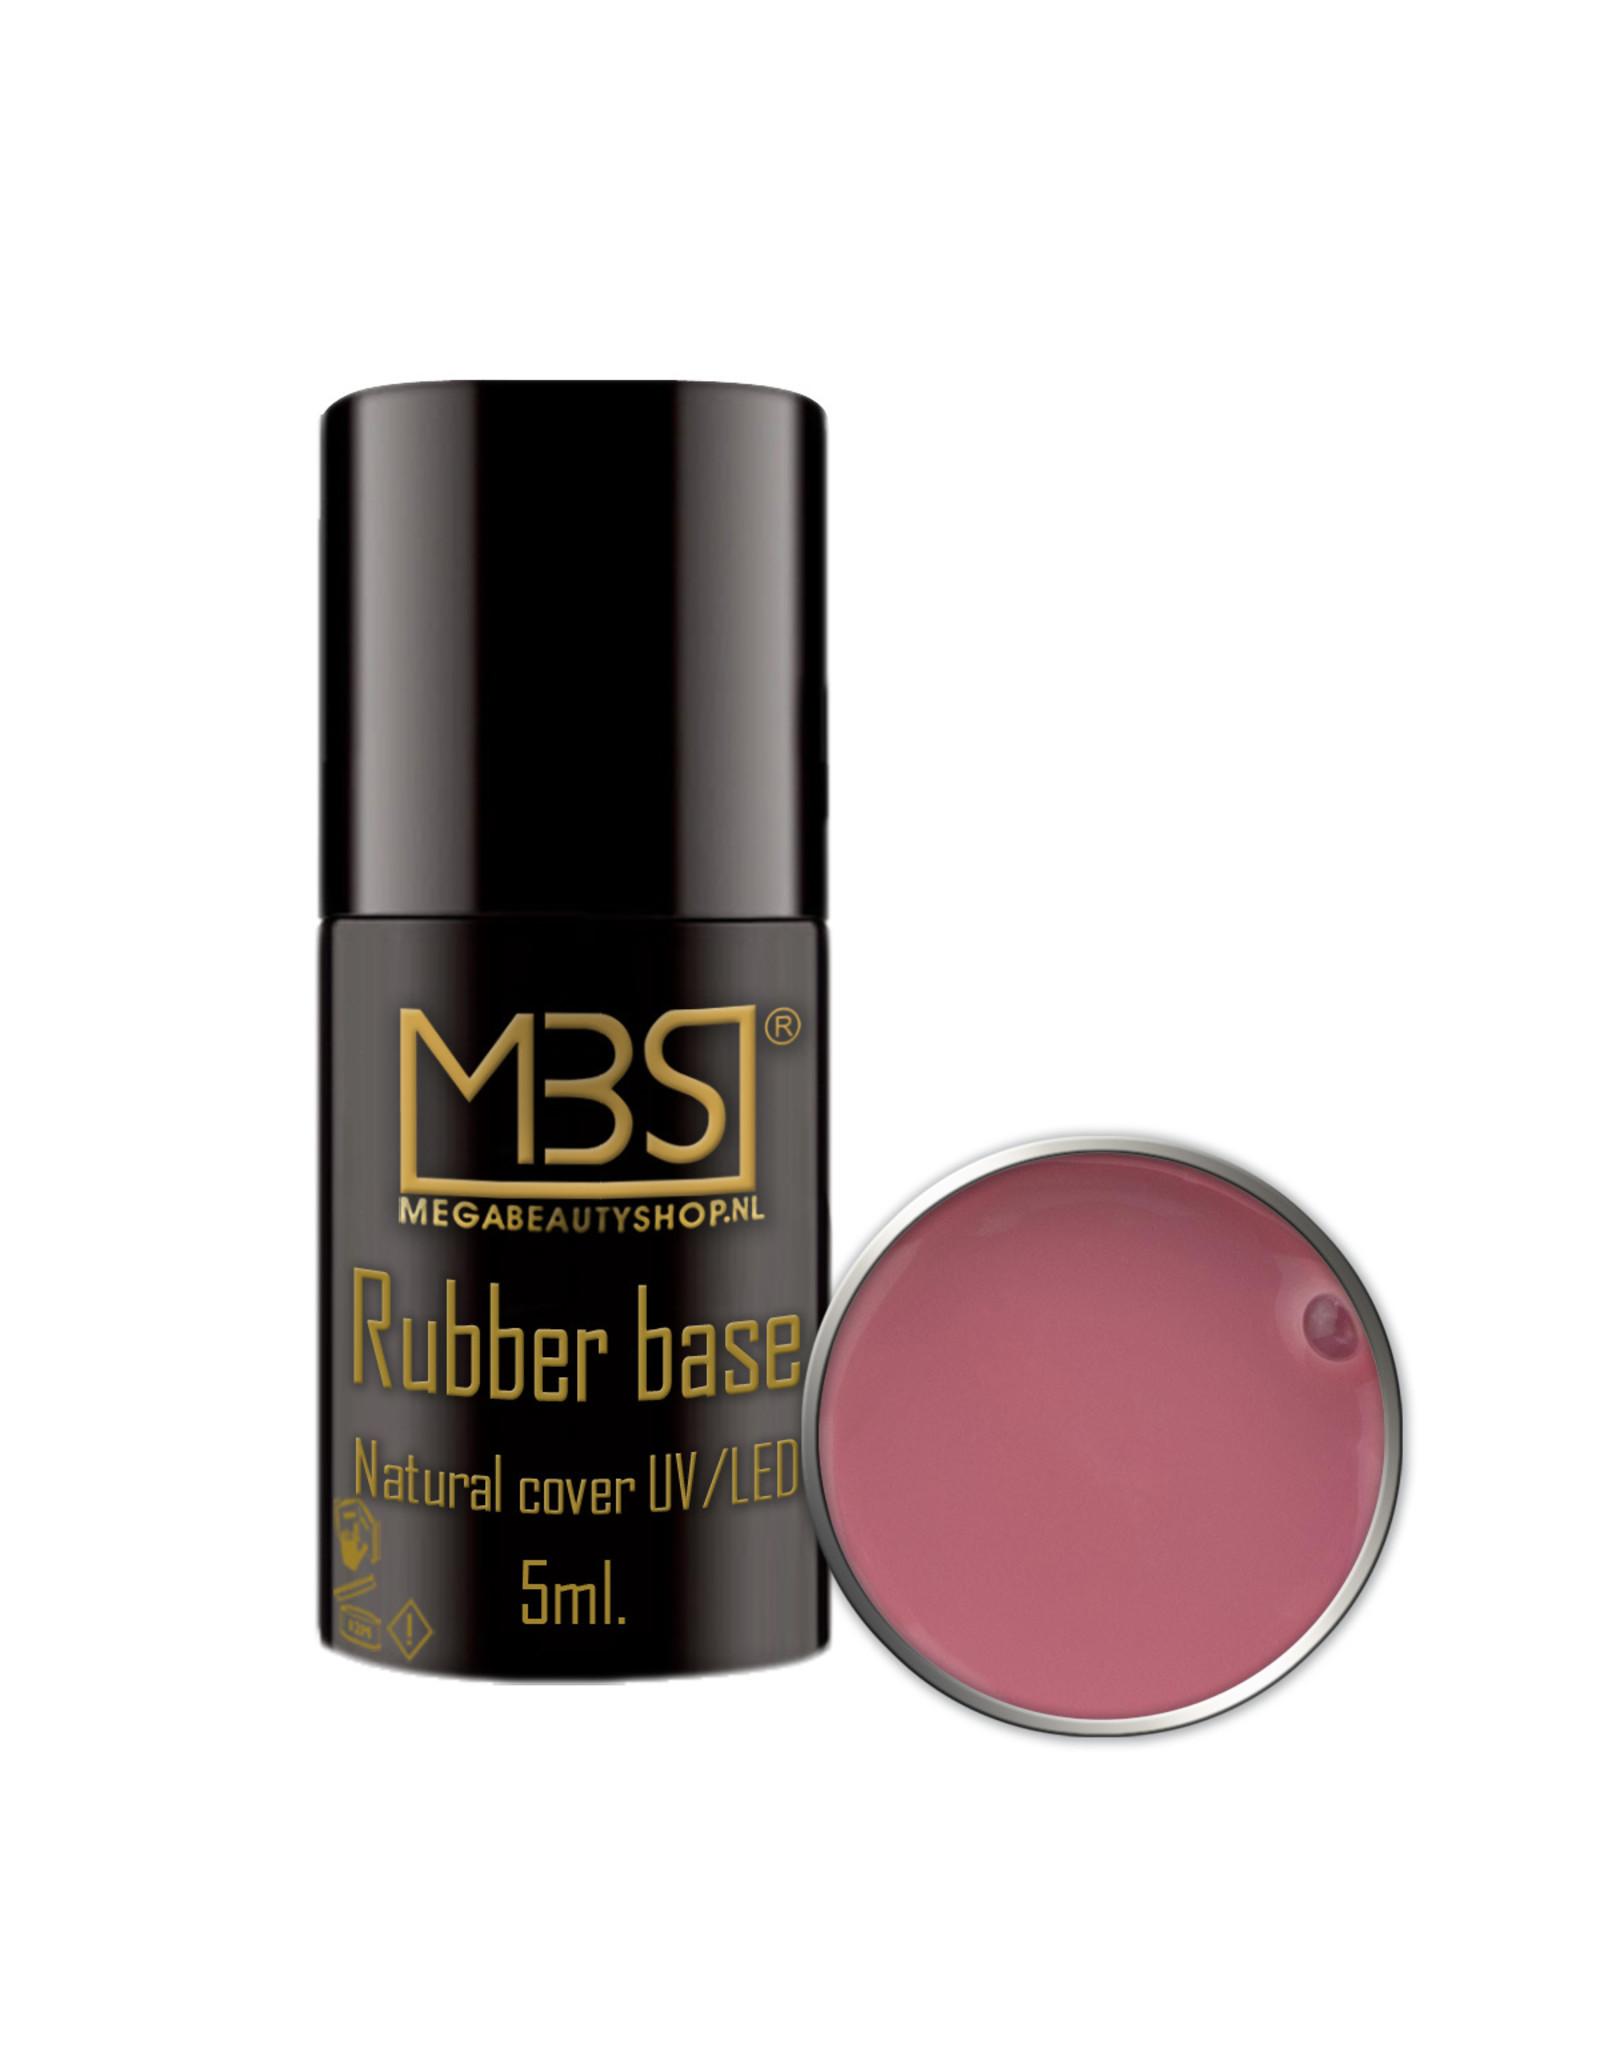 Mega Beauty Shop® Rubber Base Naturel cover 5ml.